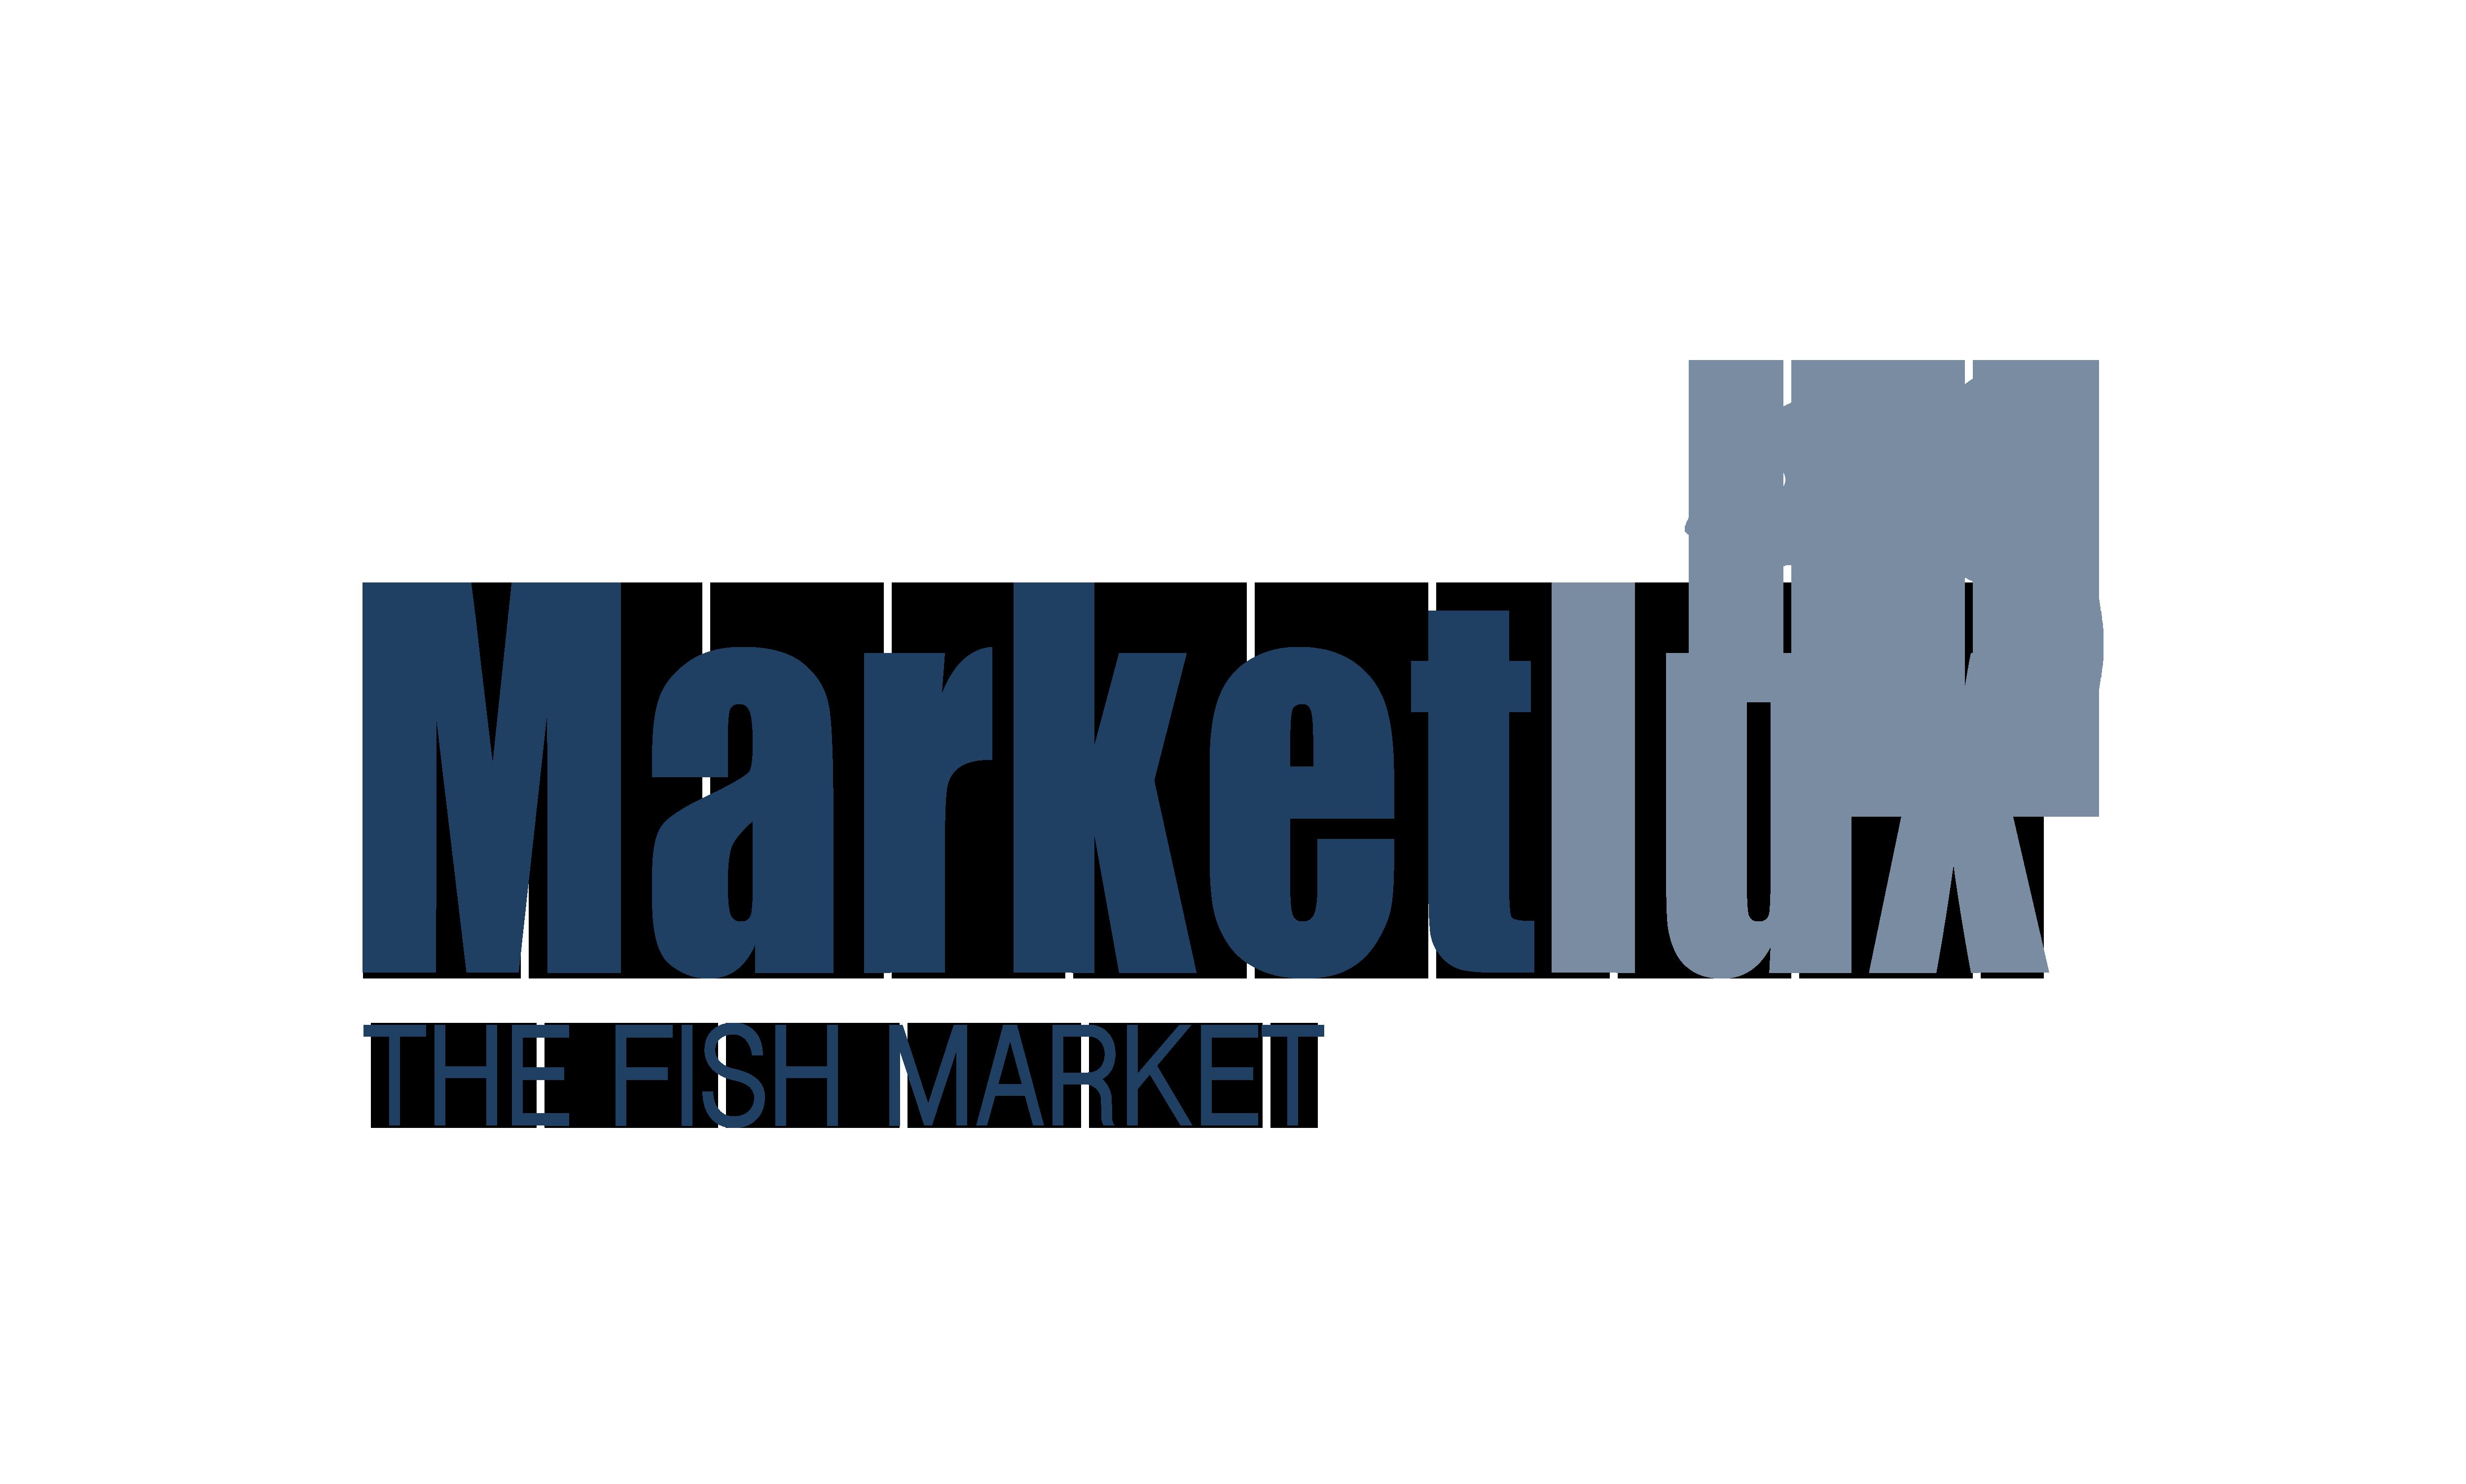 Marketlux